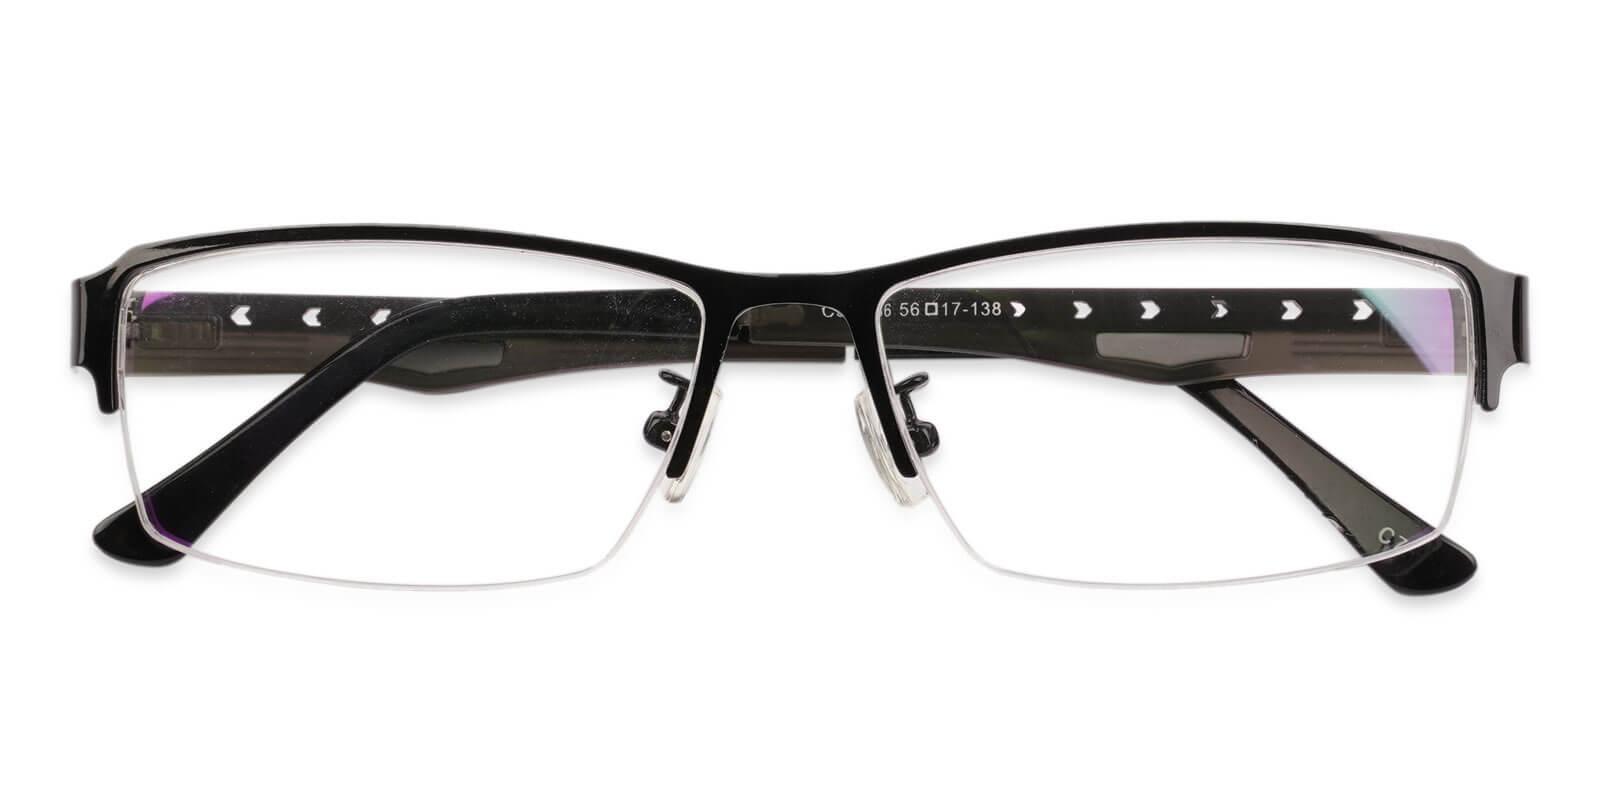 David Black Metal Eyeglasses , NosePads Frames from ABBE Glasses